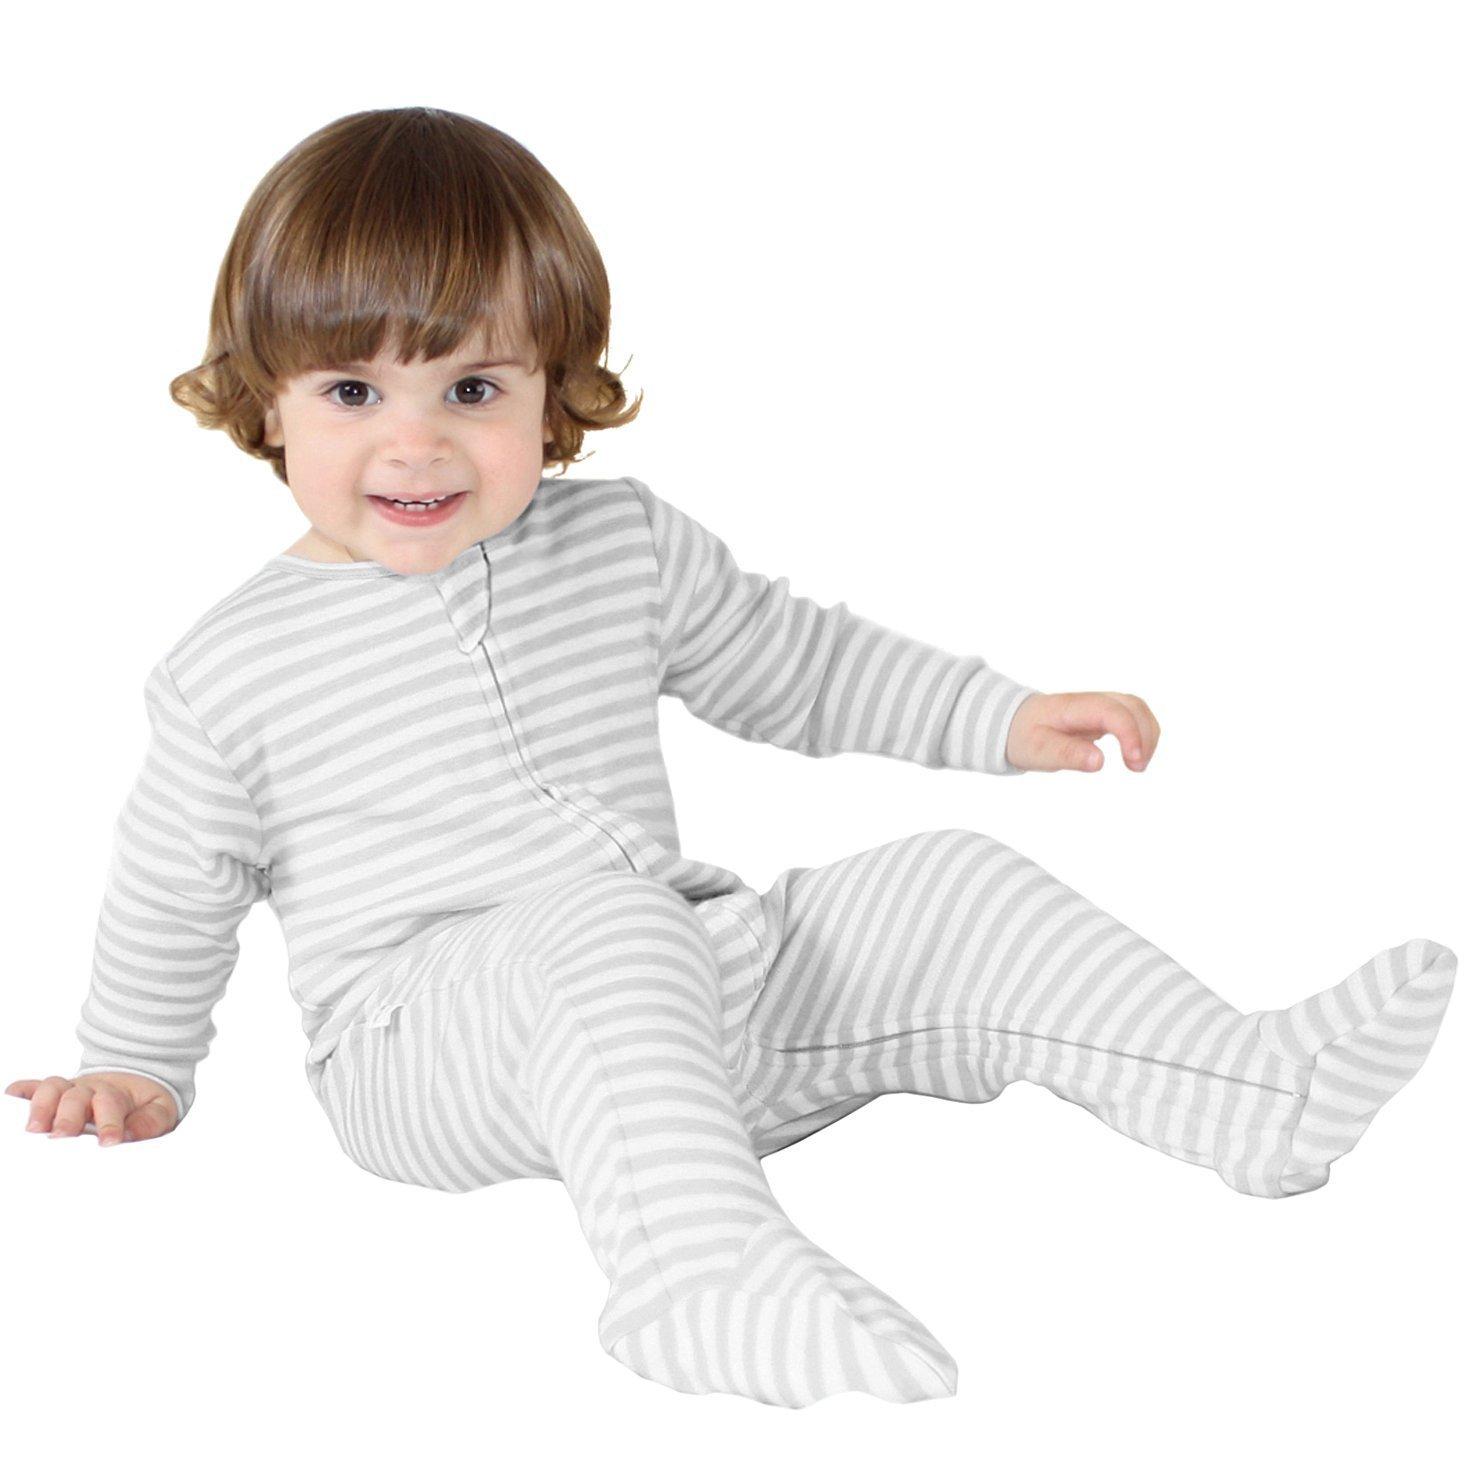 Woolino Footie Sleeper, 100% Superfine Merino Wool Sleeper, 6-9 Months, Gray Sleeper6-9moGrayFBA